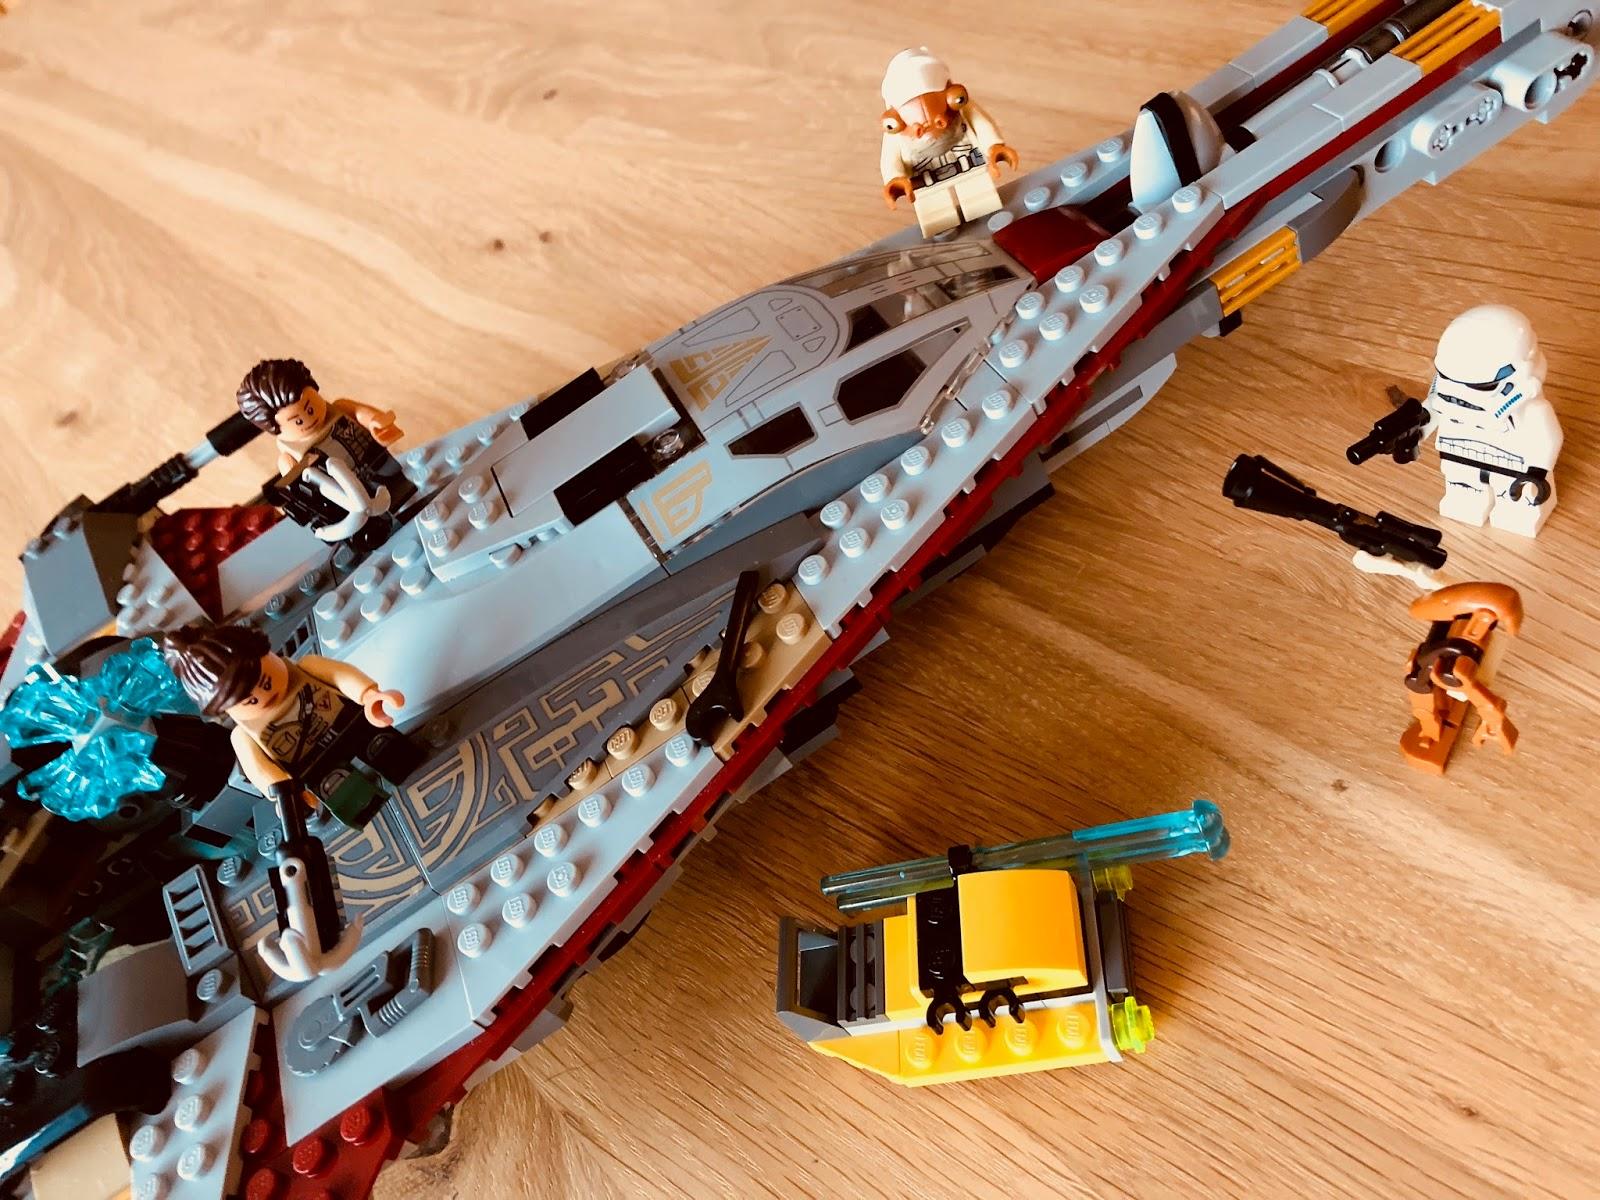 Brickwolfcampus Lego 75186 Star Wars The Arrowhead Starwars